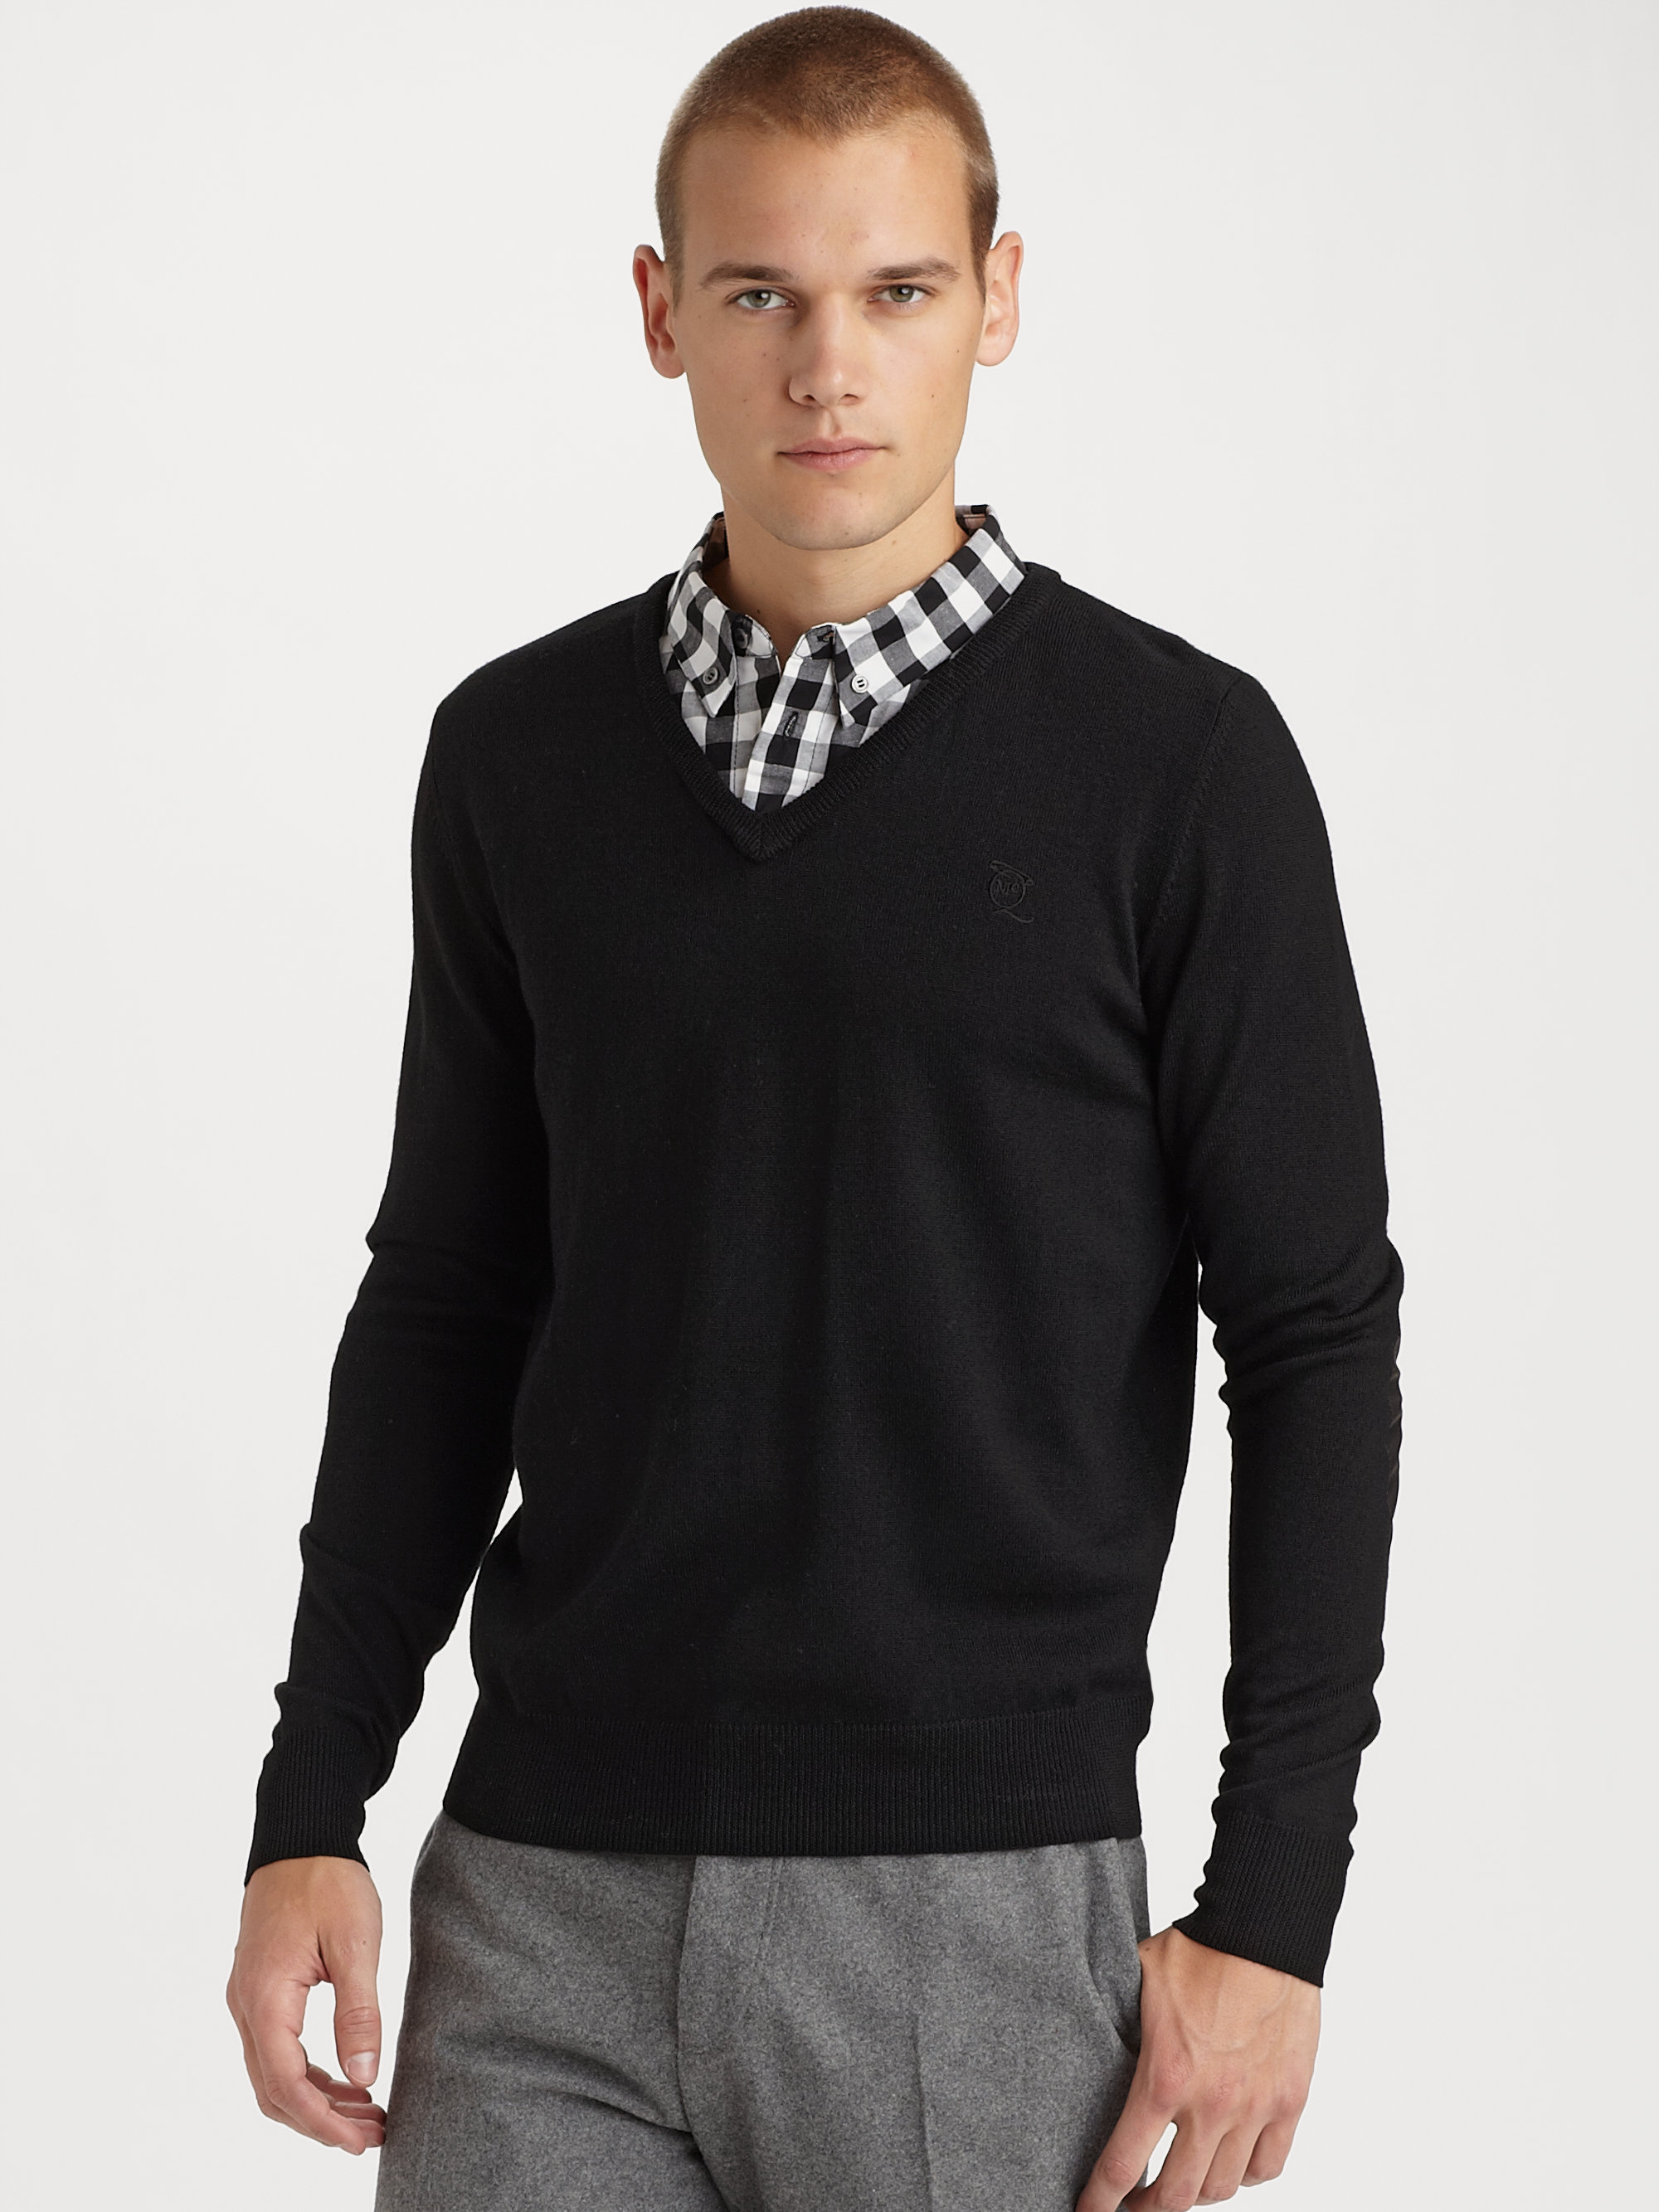 Black V Neck Sweaters